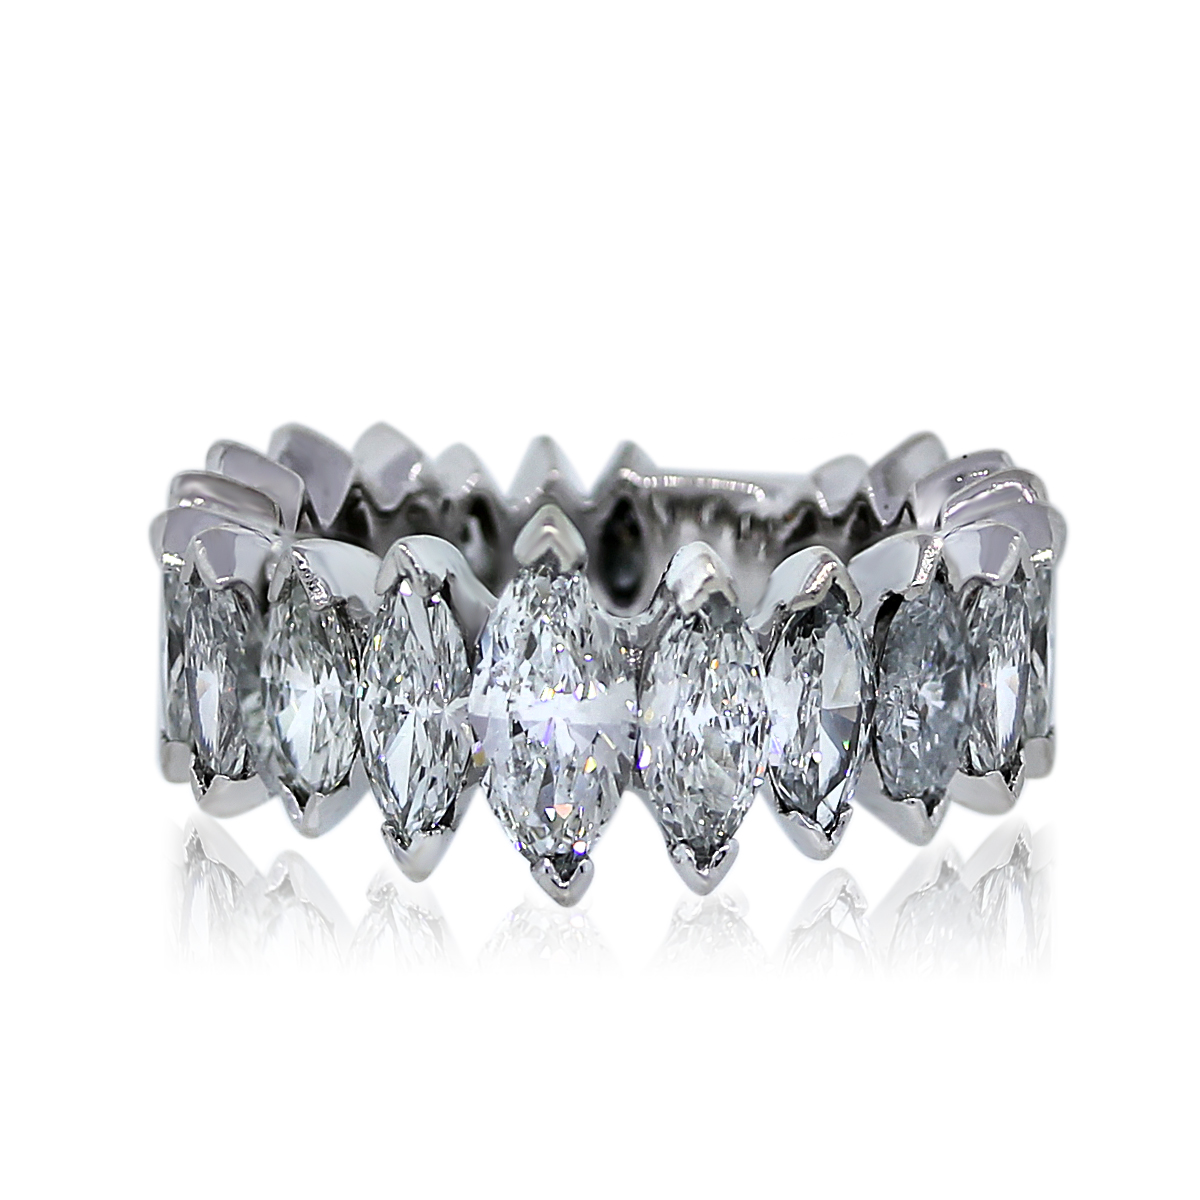 Platinum Marquise Cut 4 Ctw Diamond Eternity Band Ring